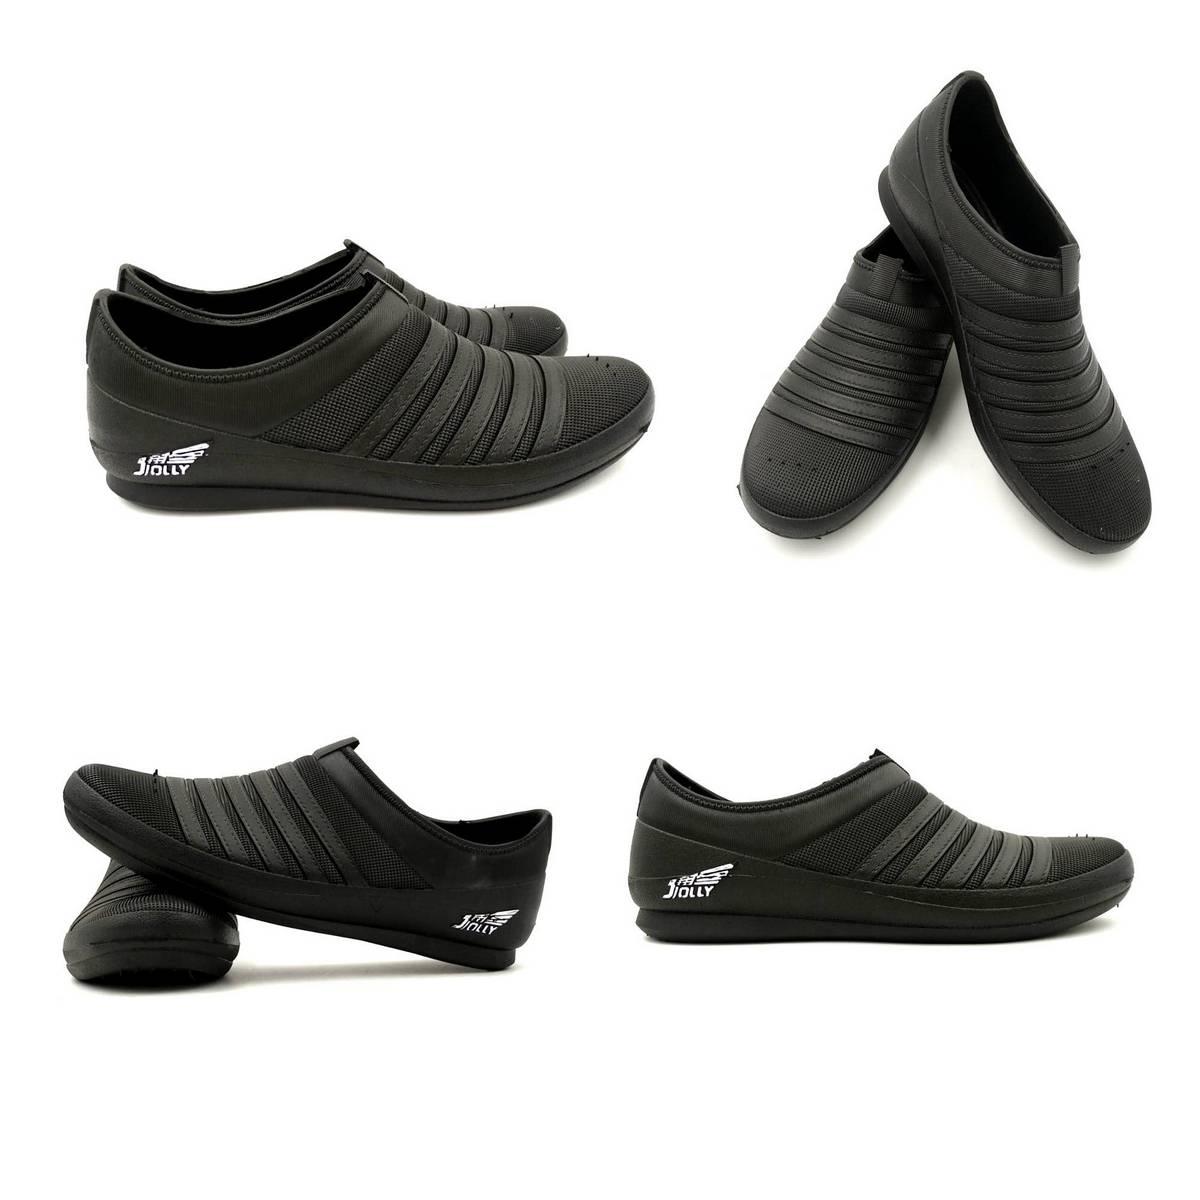 Casual Black Rubber Shoes For Men